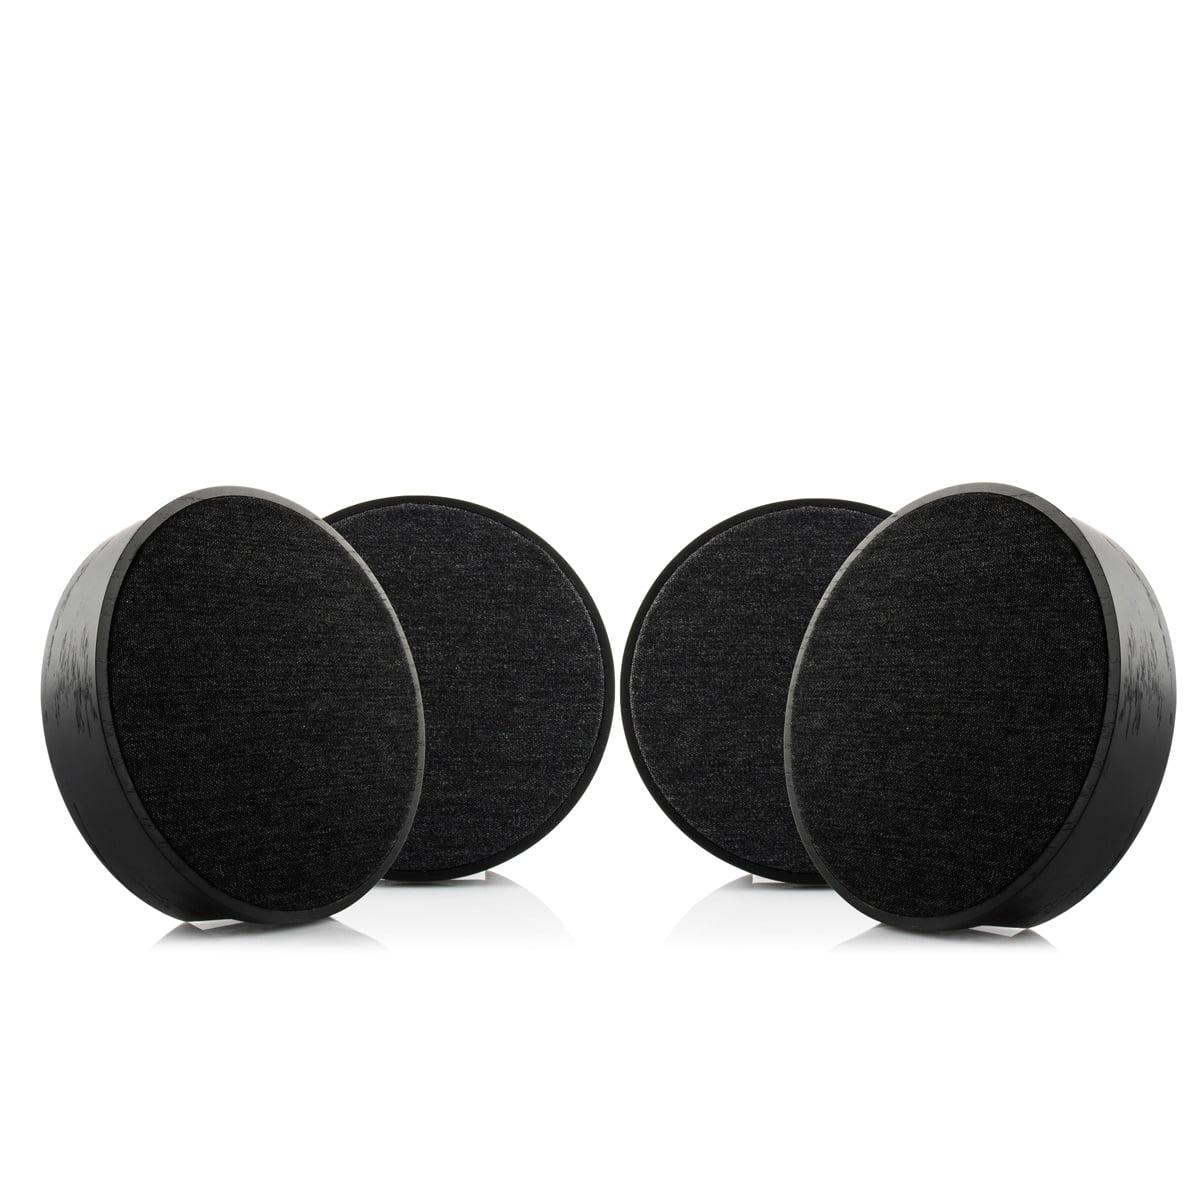 Tivoli Audio SPHERA Wireless Speakers Set of 4 by Tivoli Audio